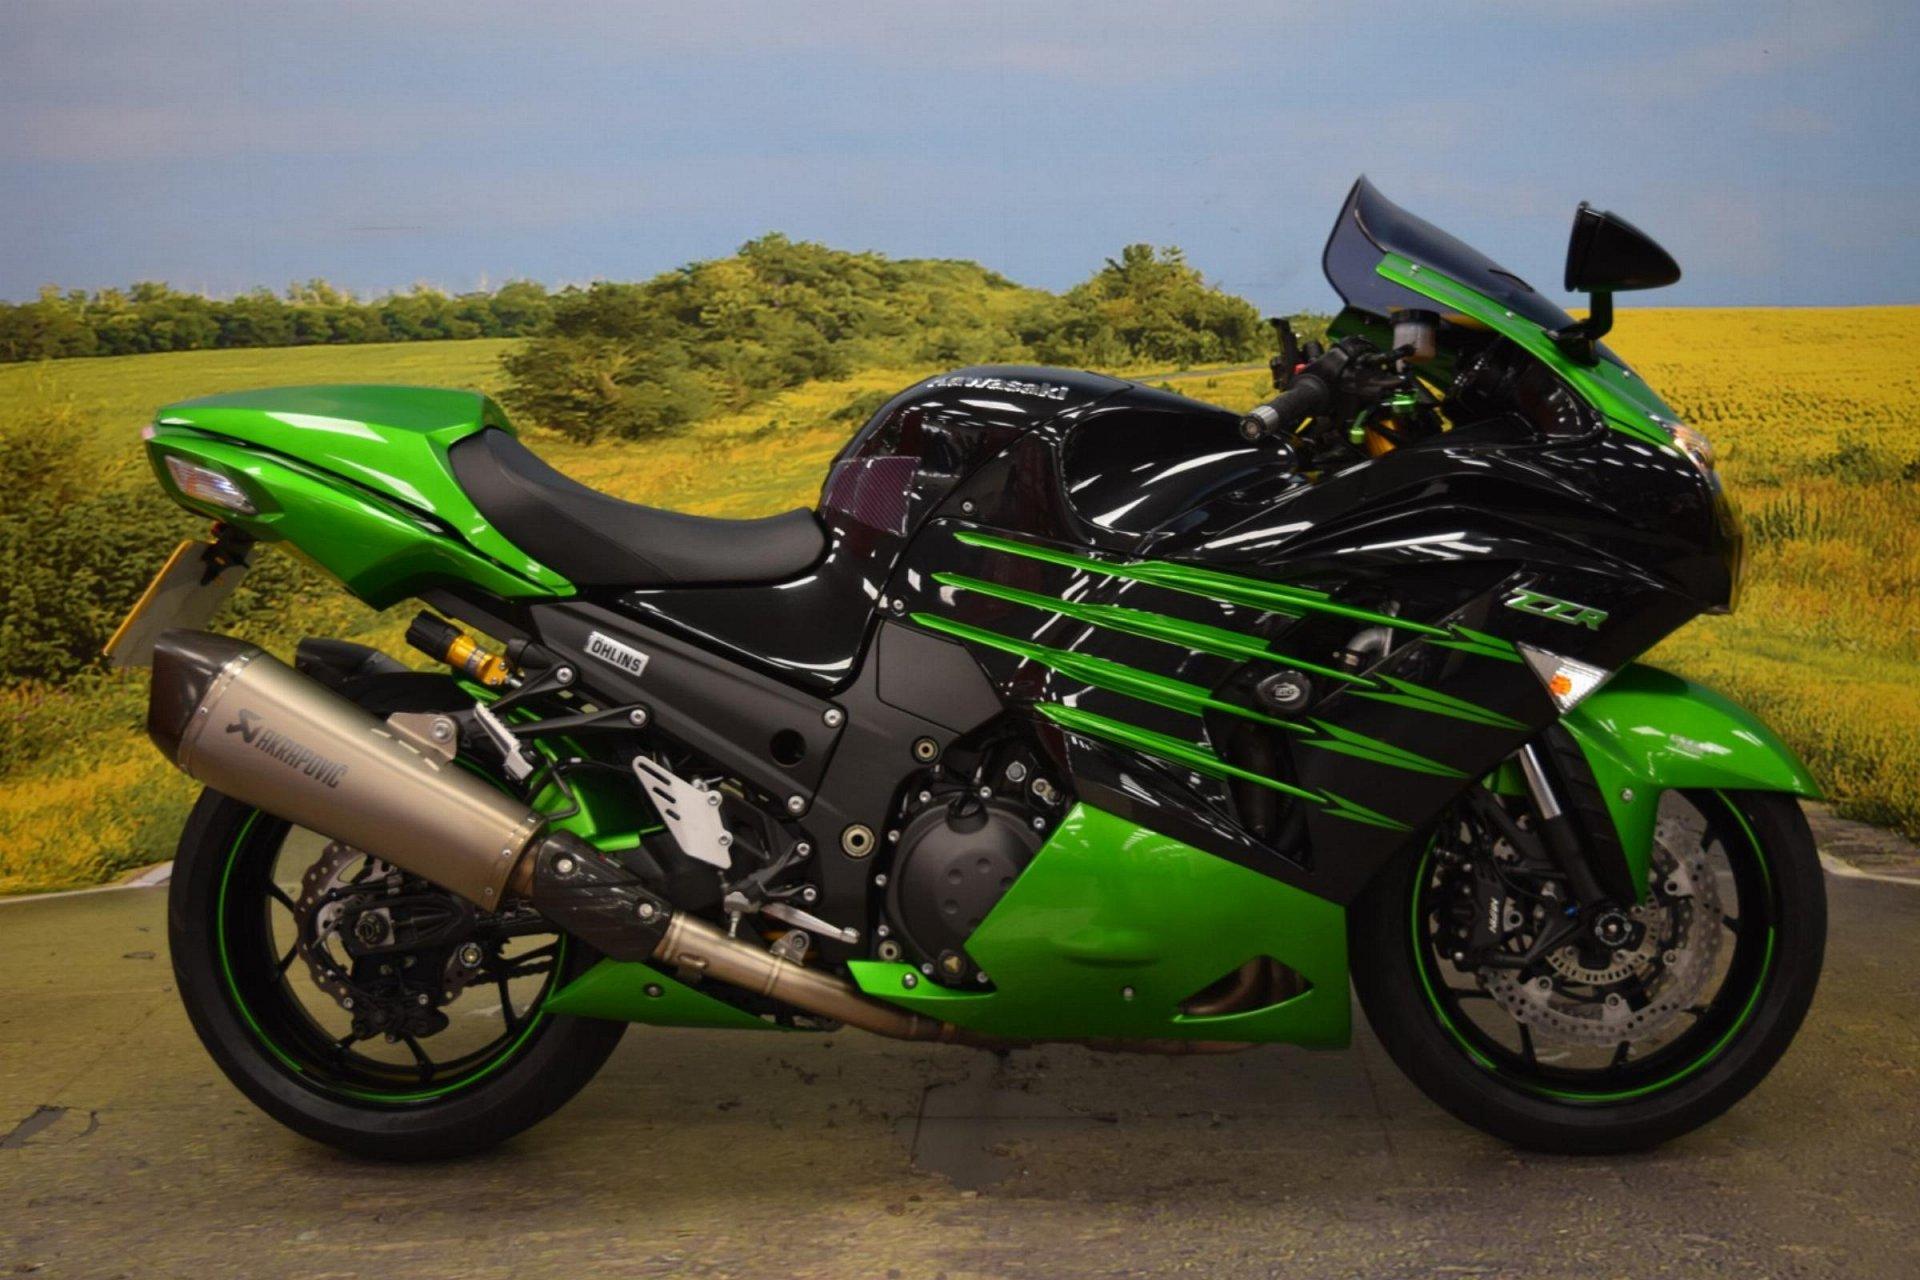 2015 Kawasaki ZZR 1400 Performance Sport for sale in Staffordshire